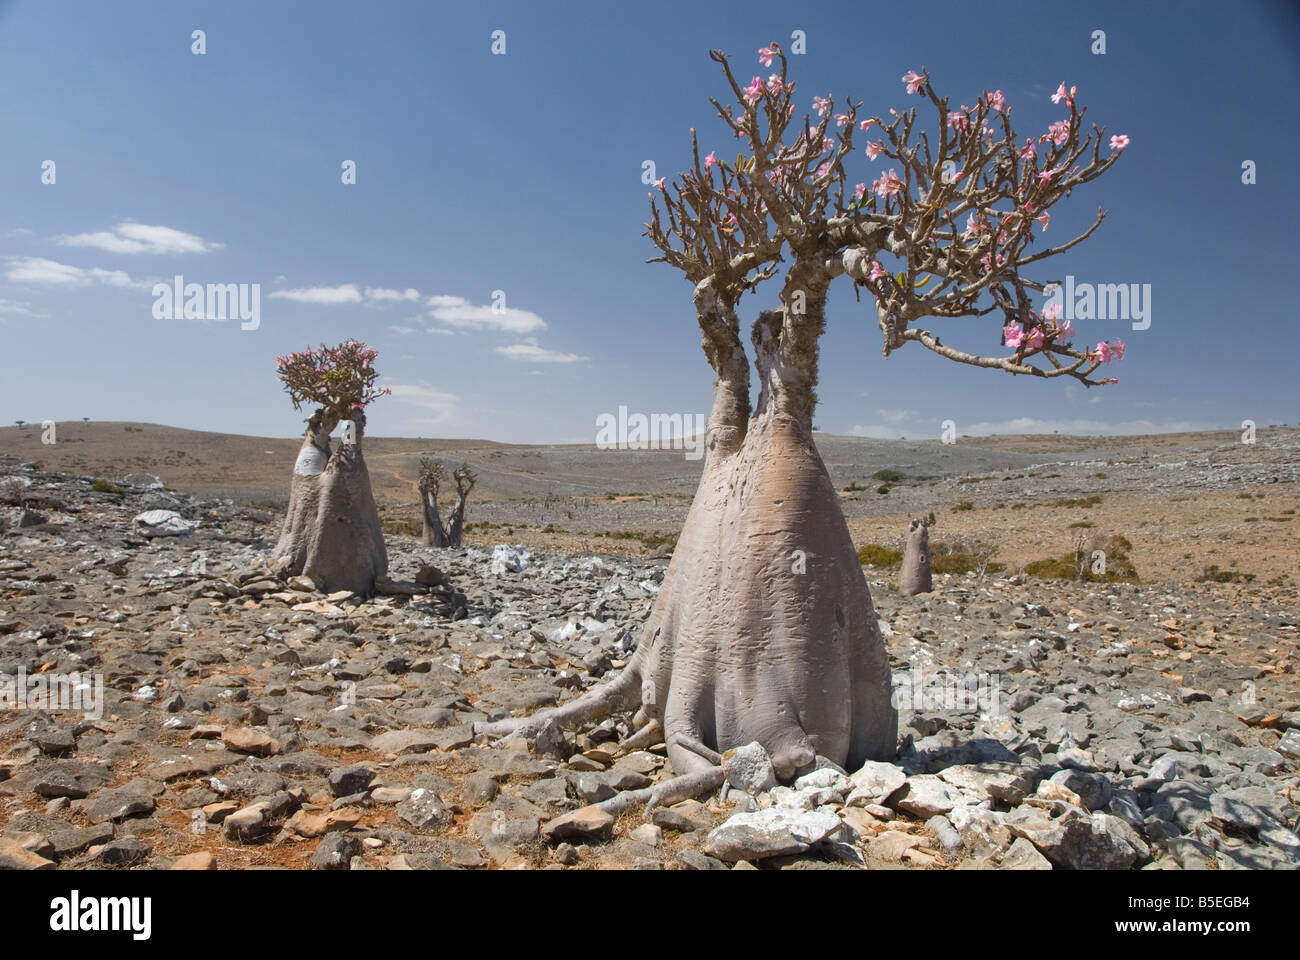 Bottle tree desert rose adenium obesum endemic to island Diksam Plateau central Socotra Island Yemen Middle East - Stock Image